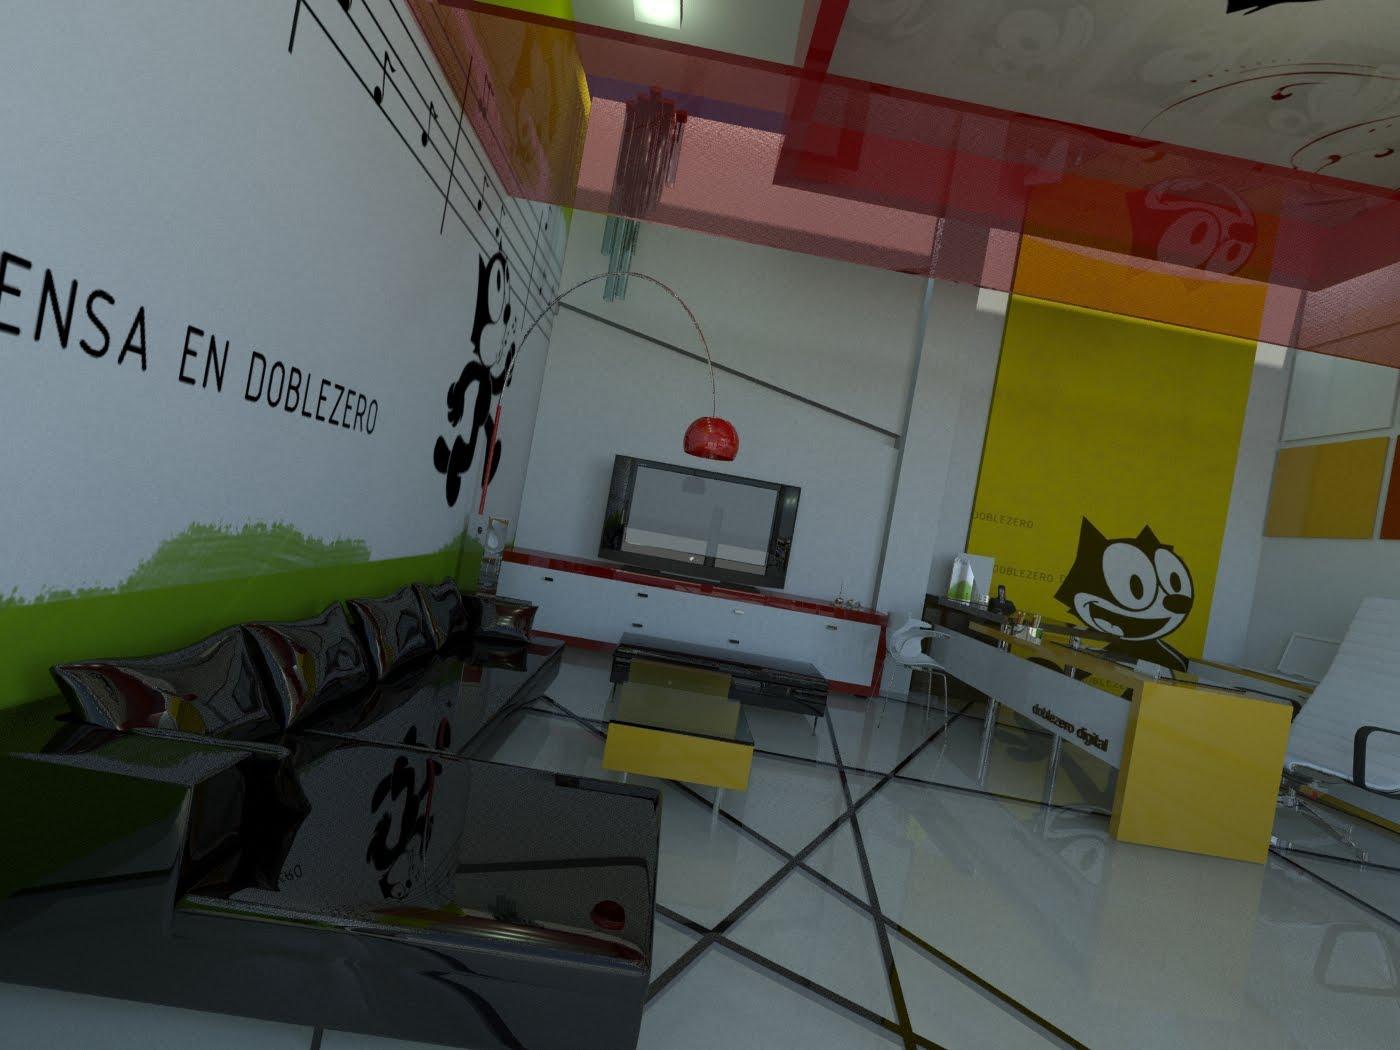 Lapizartedigital dise o oficinas doblezero for Diseno de oficinas 2018